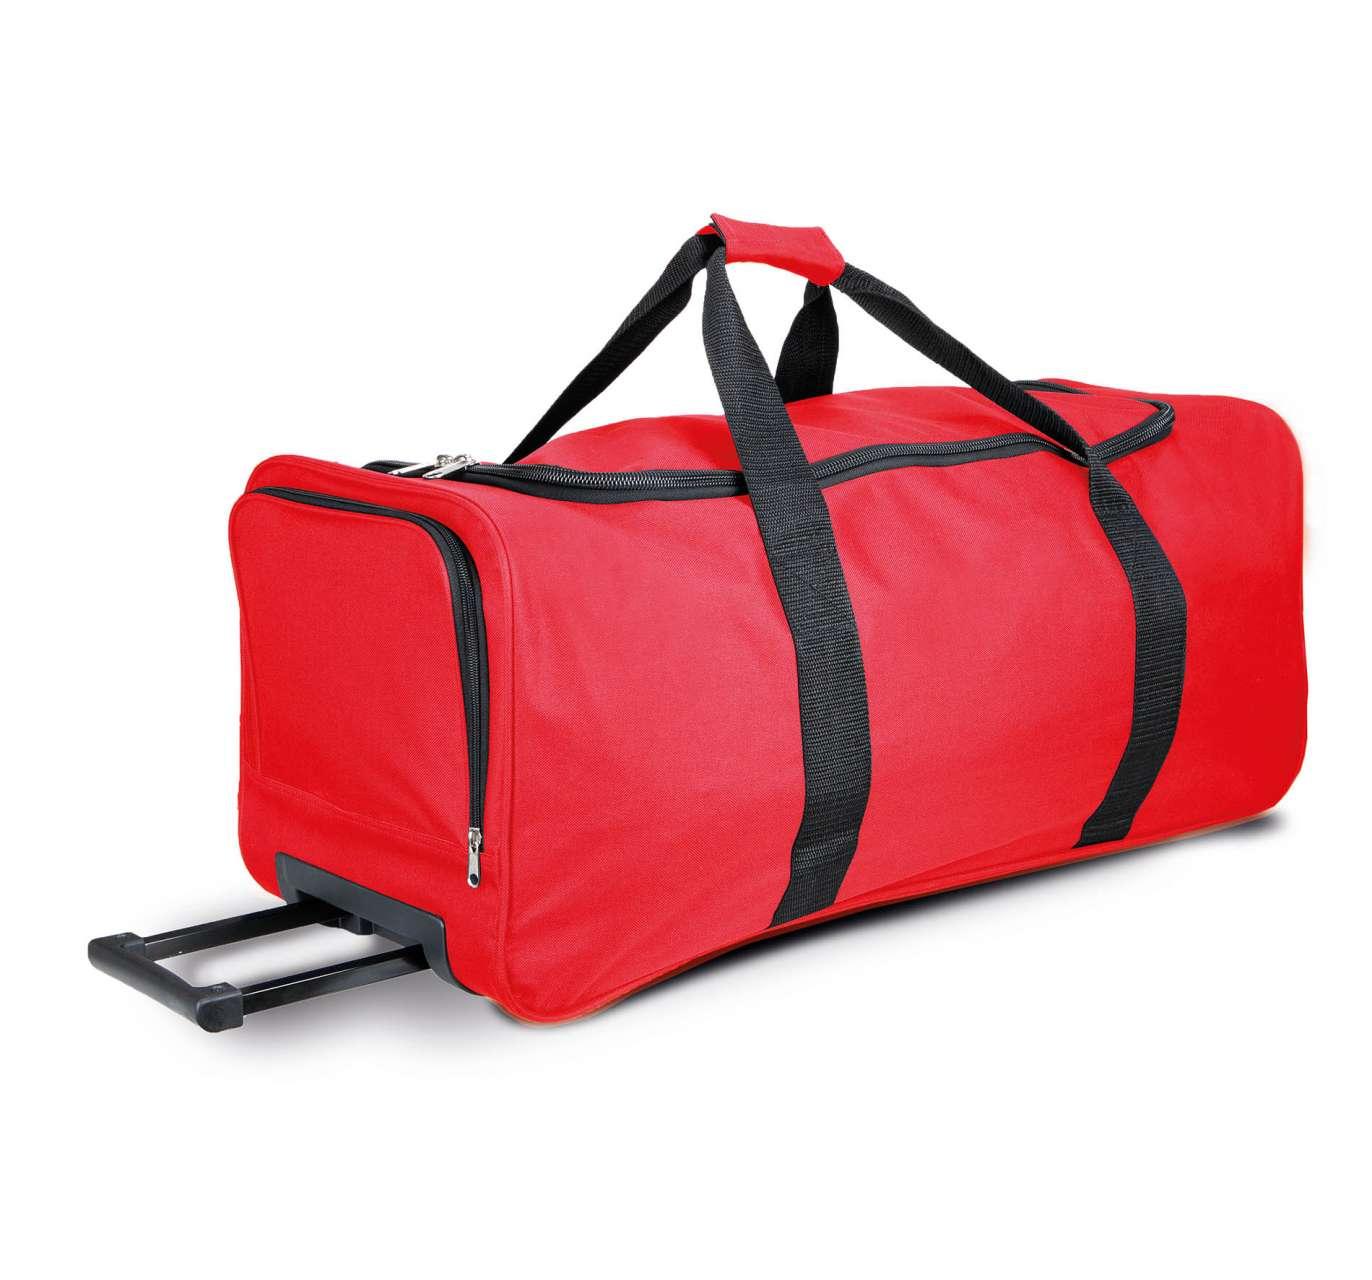 Geanta troller KI0812 rosie Genti rucsacuri personalizate conferinta laptop sport compartiment serigrafie broderie termotransfer